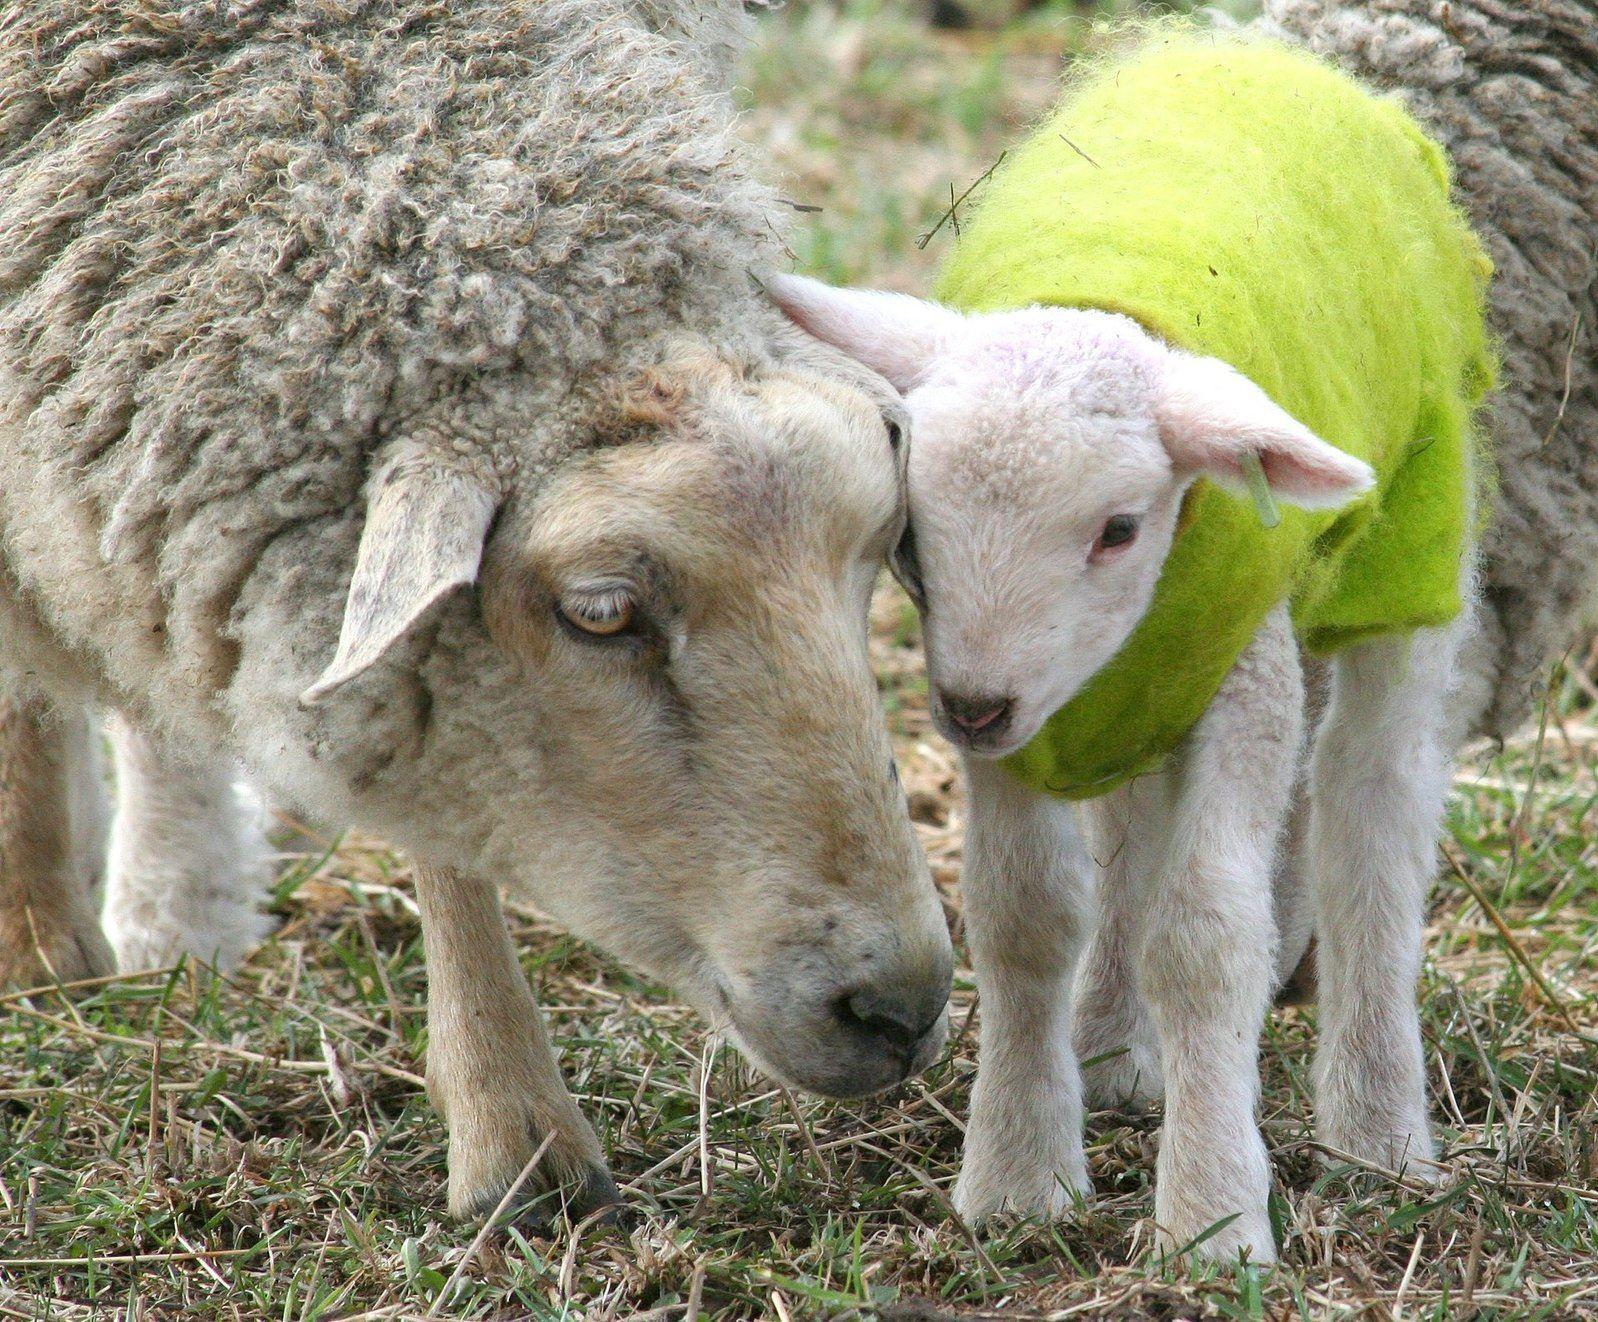 Sheep shop